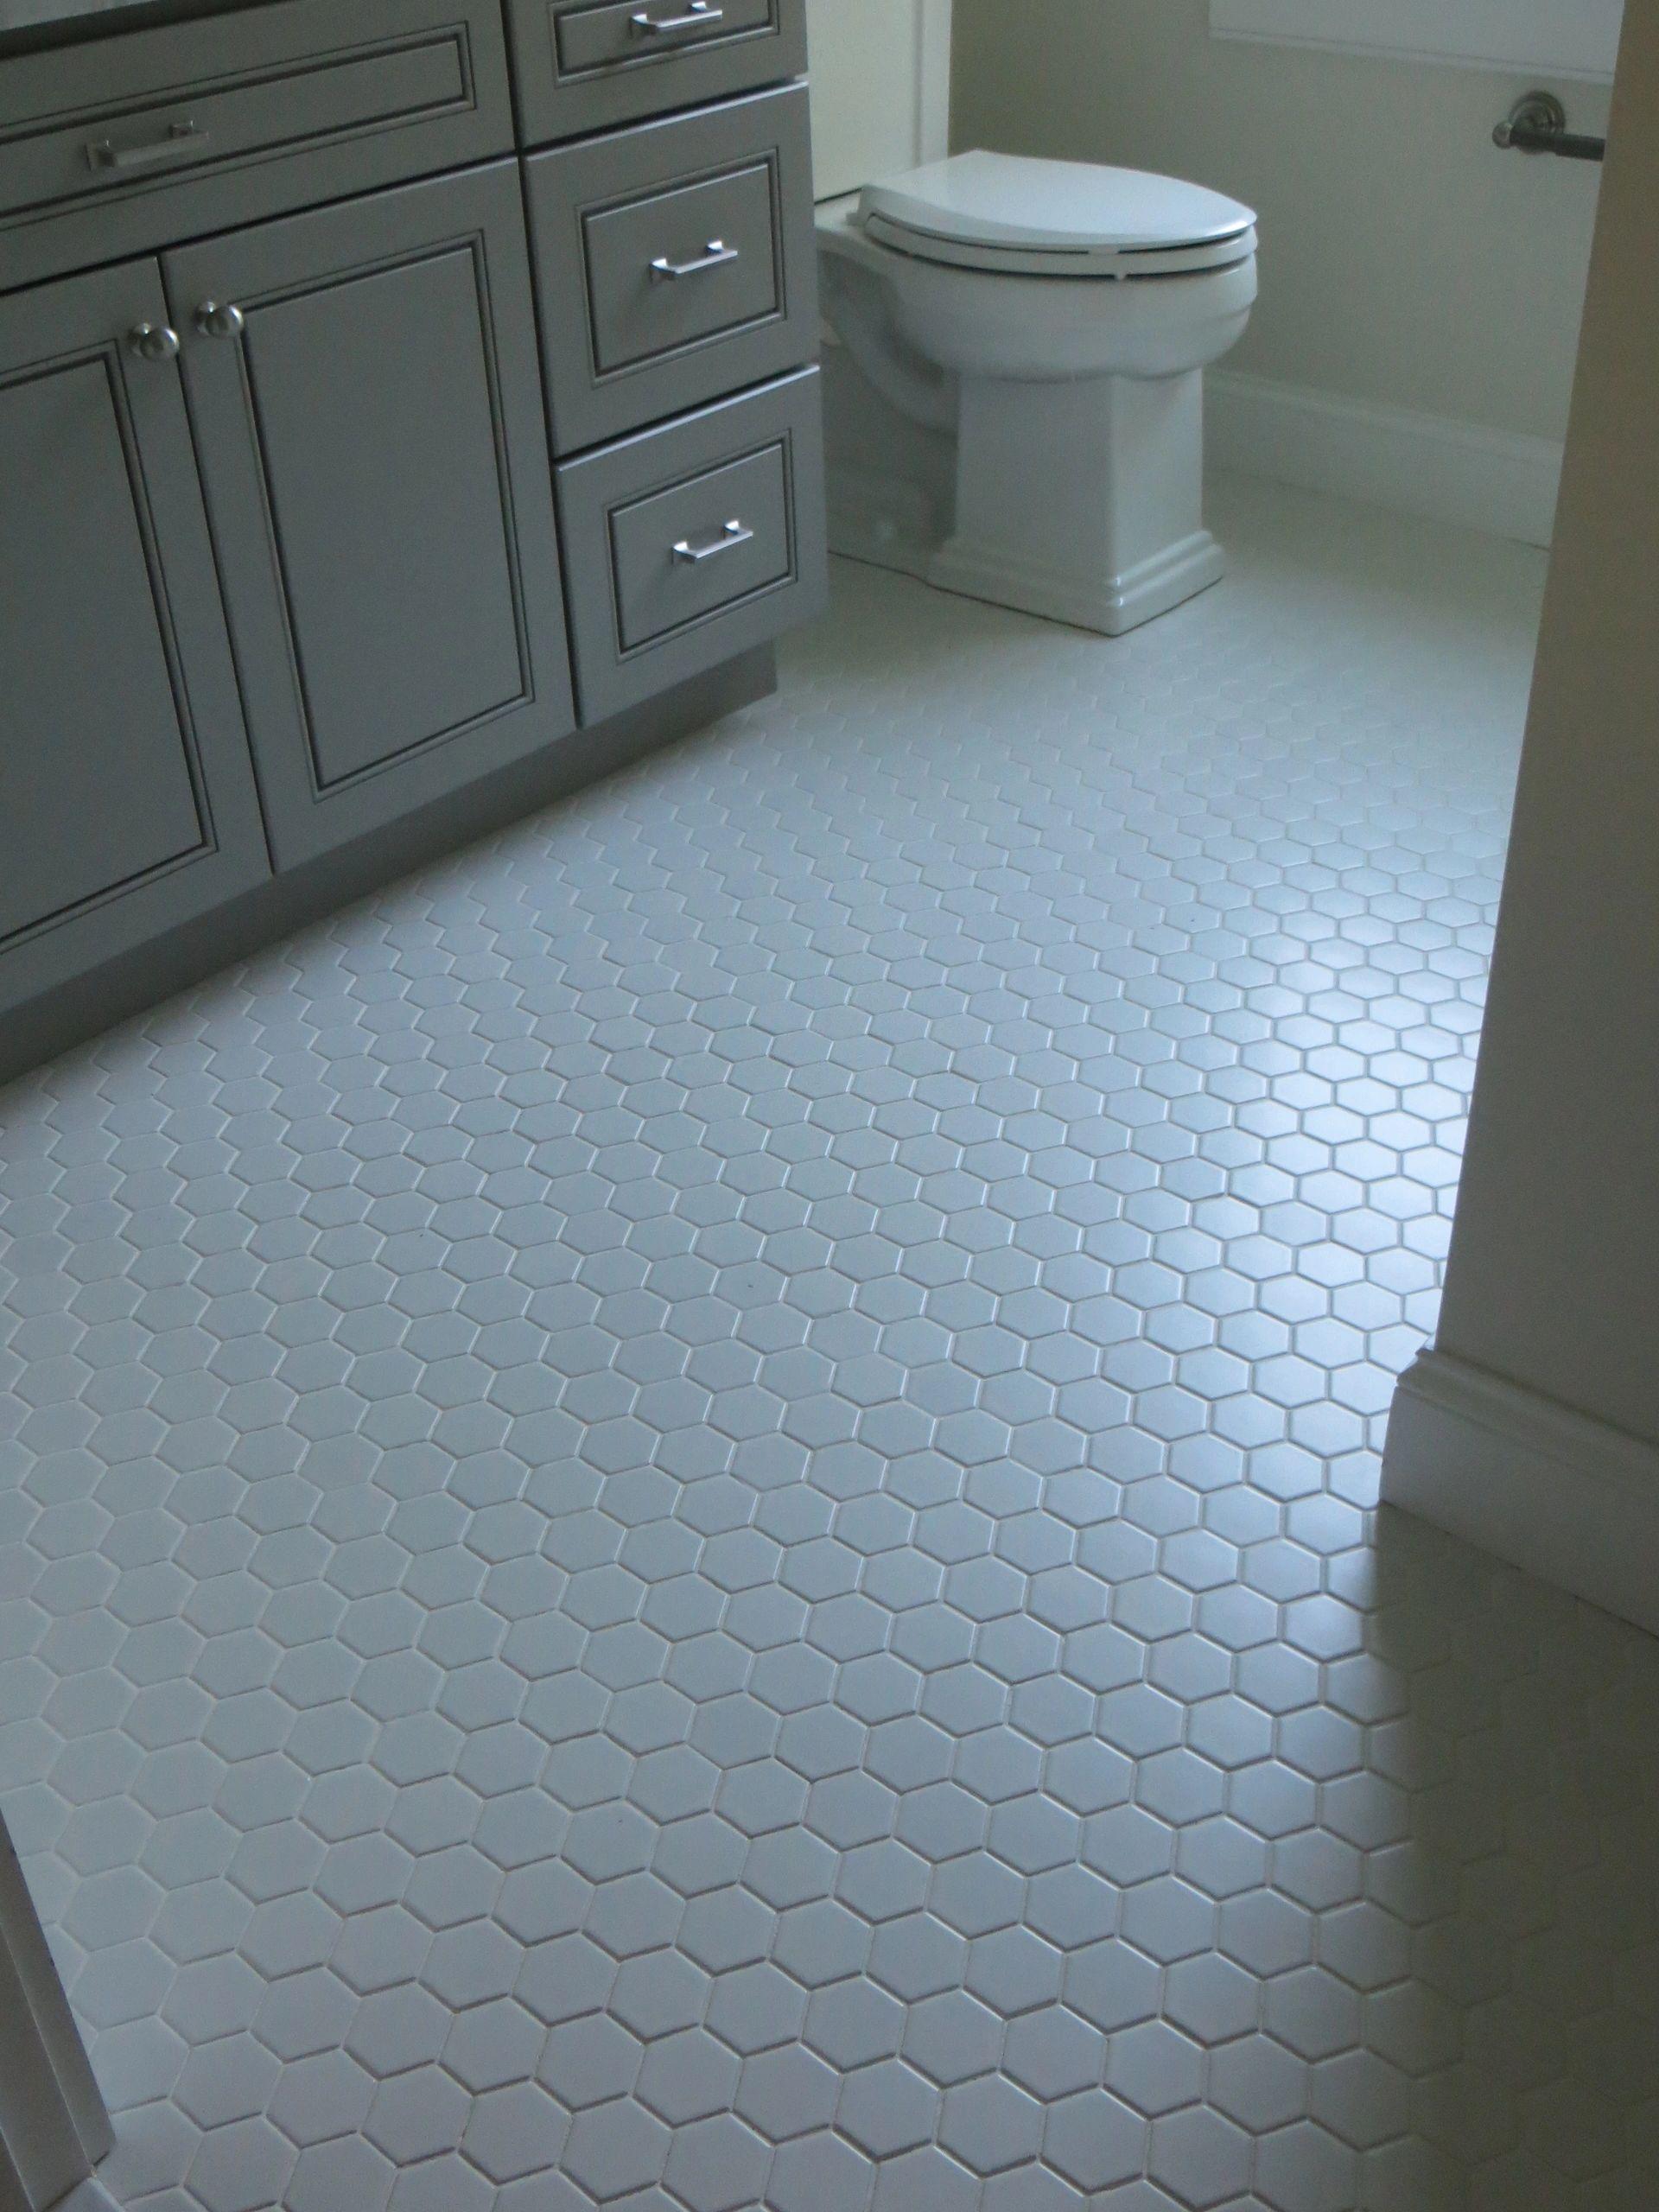 TROILA RENOVATIONS - Kitchen Remodeling, Tile Installation